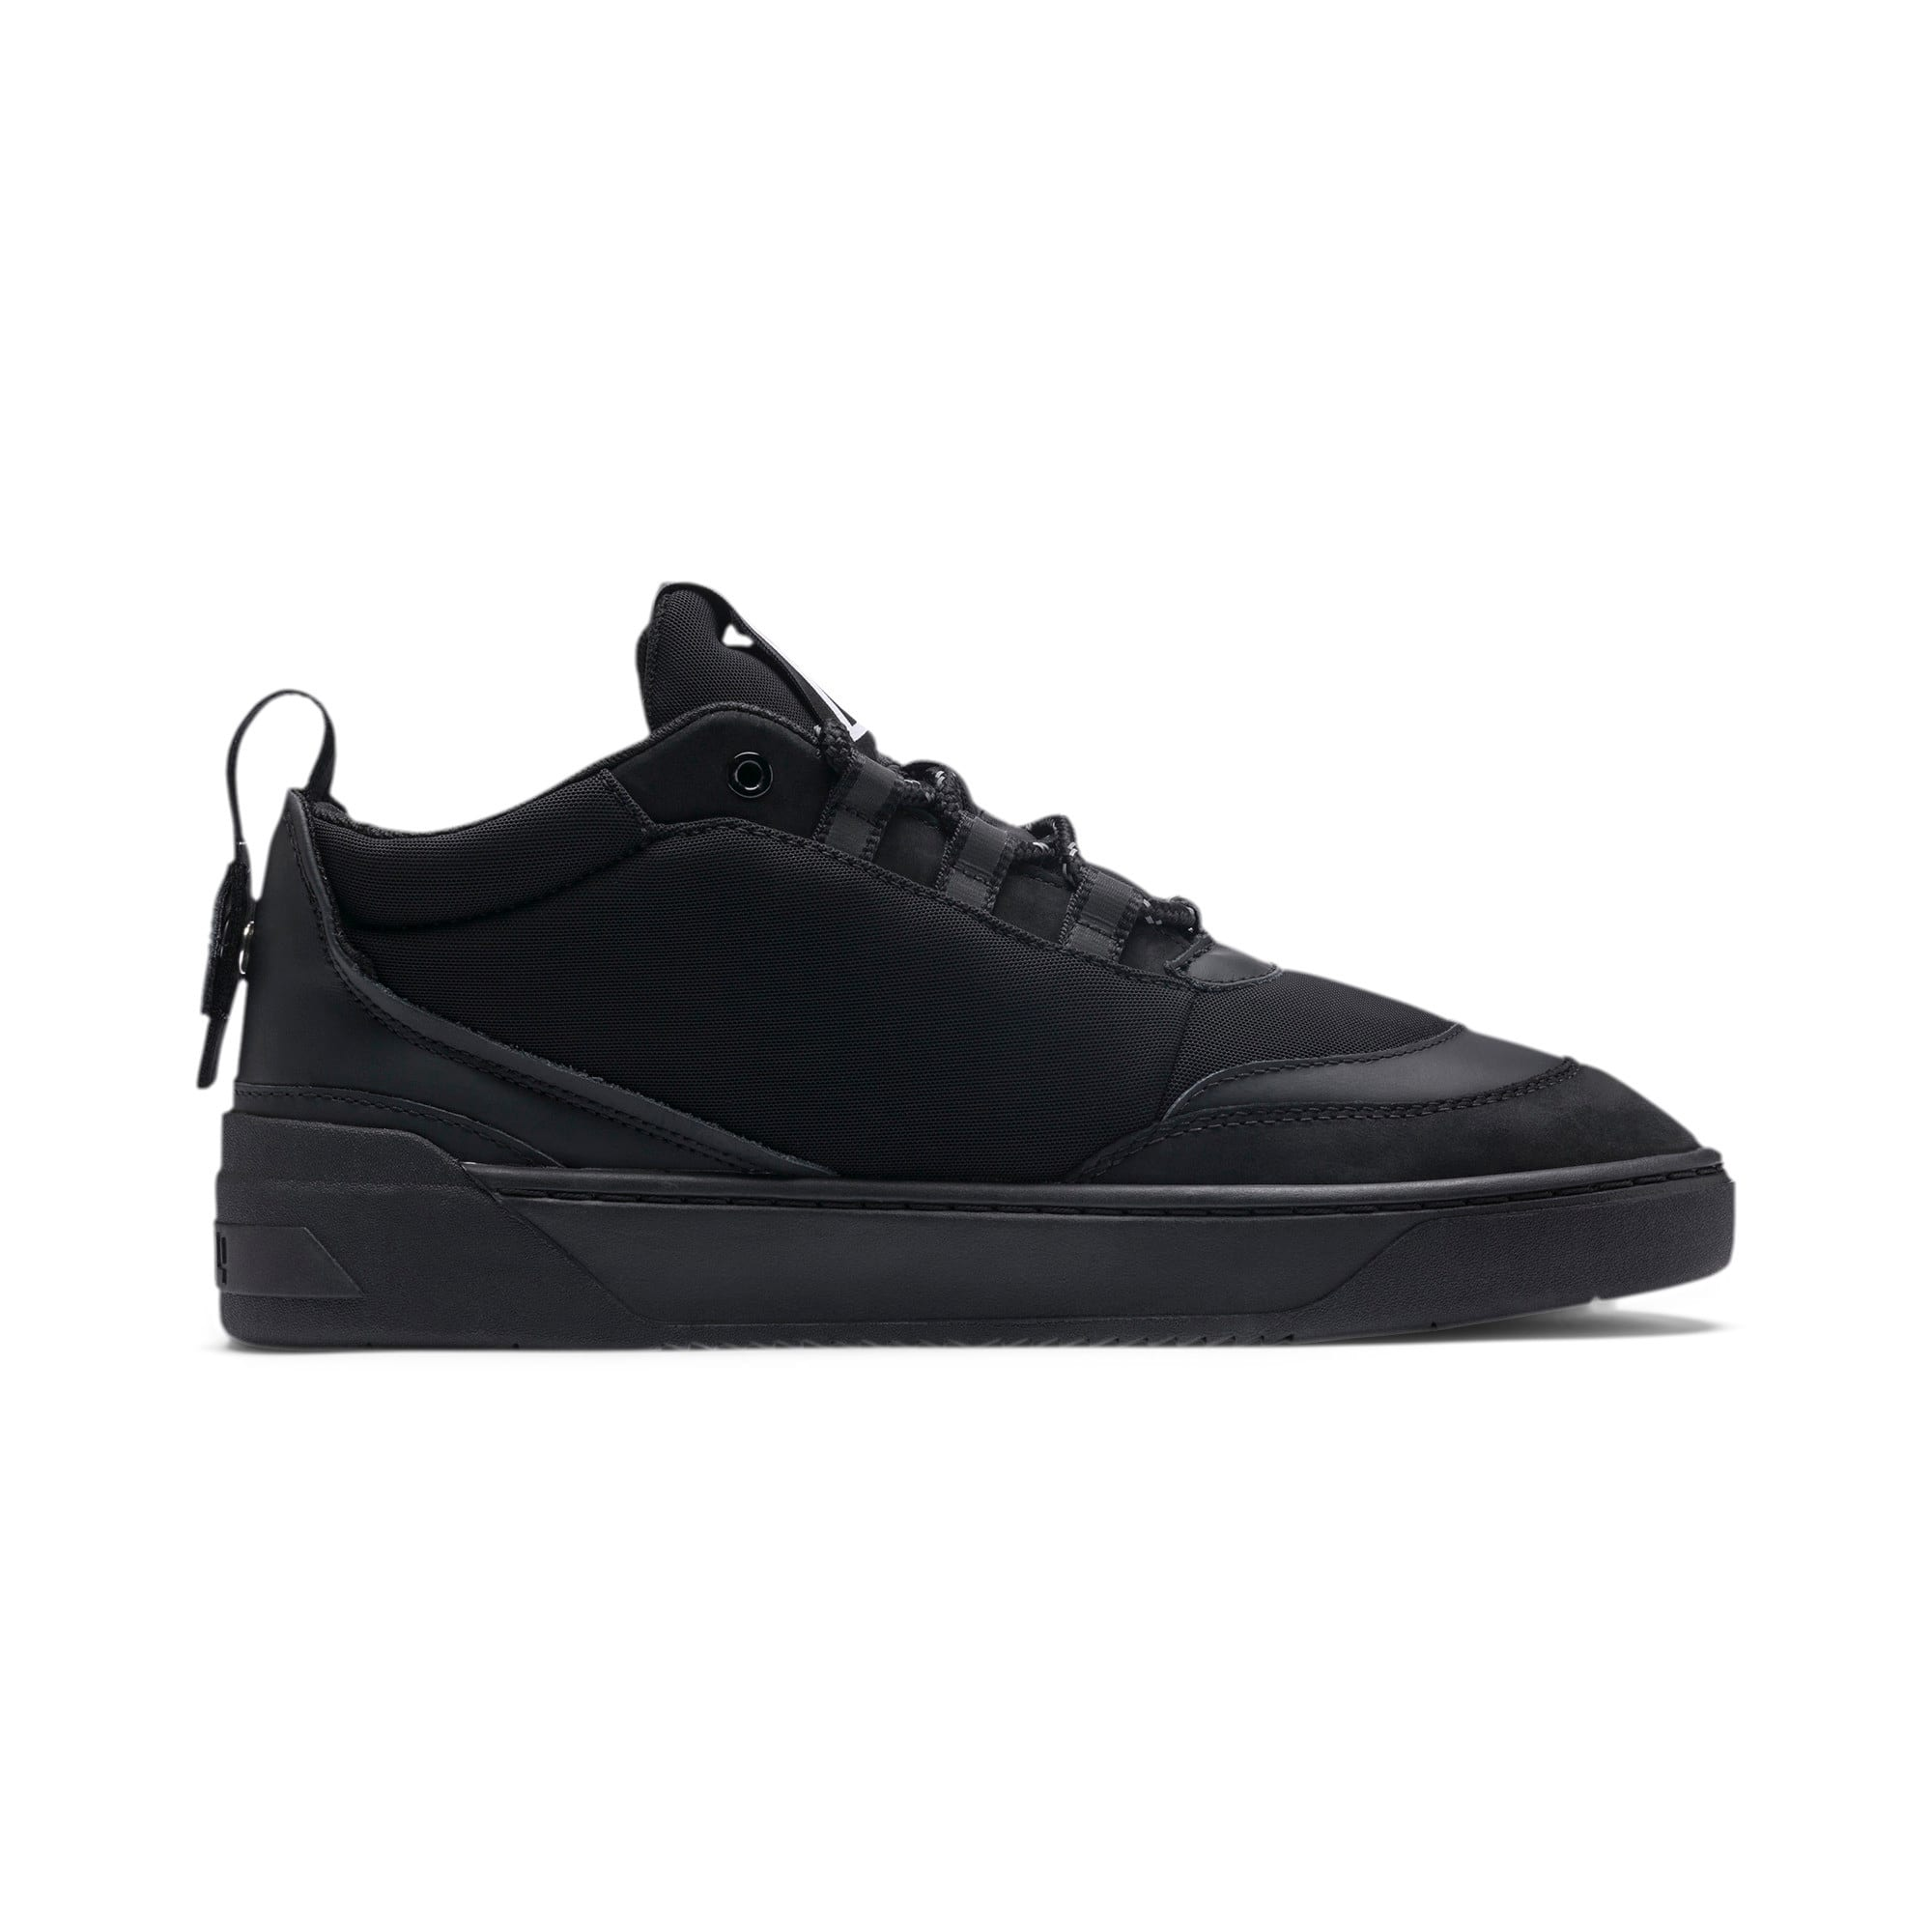 Thumbnail 5 of Cali Zero Demi Triple Black Sneakers, Puma Black-Puma Black, medium